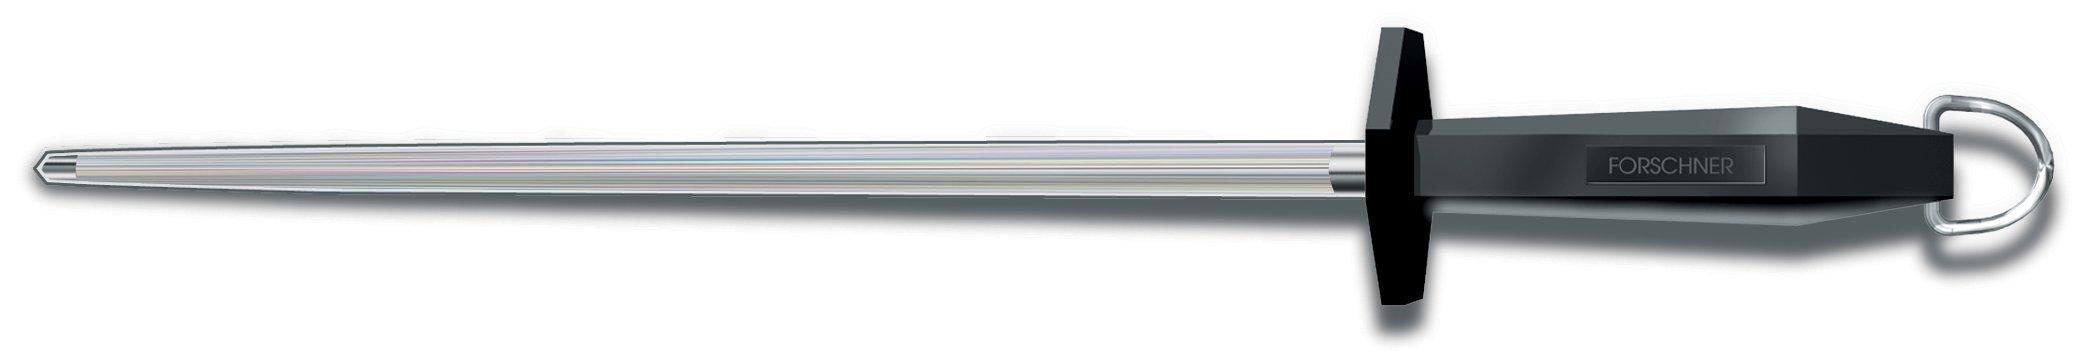 Victorinox Honing Steel 14-Inch Round Regular Cut, Black Plastic Handle